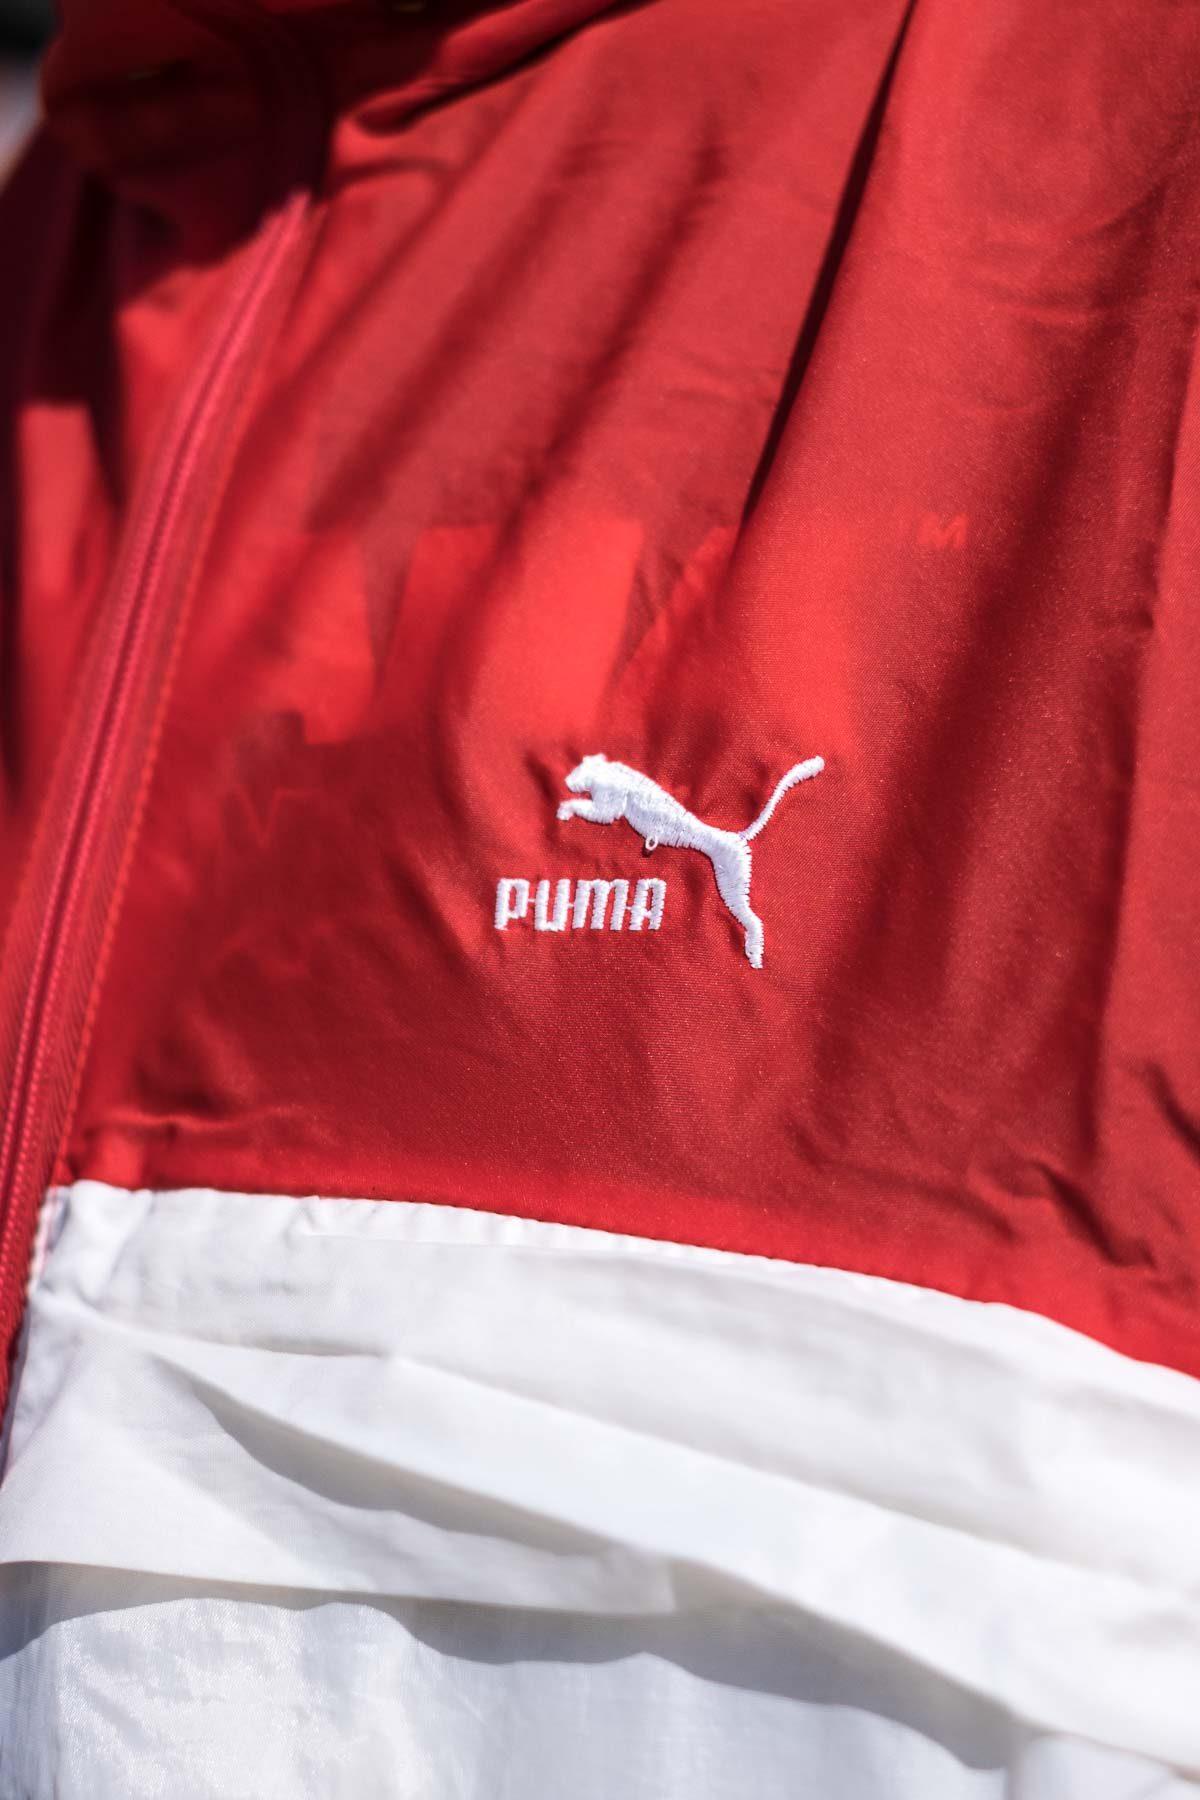 Puma GIACCA A VENTO VINTAGE 90S Rosso-Bianco